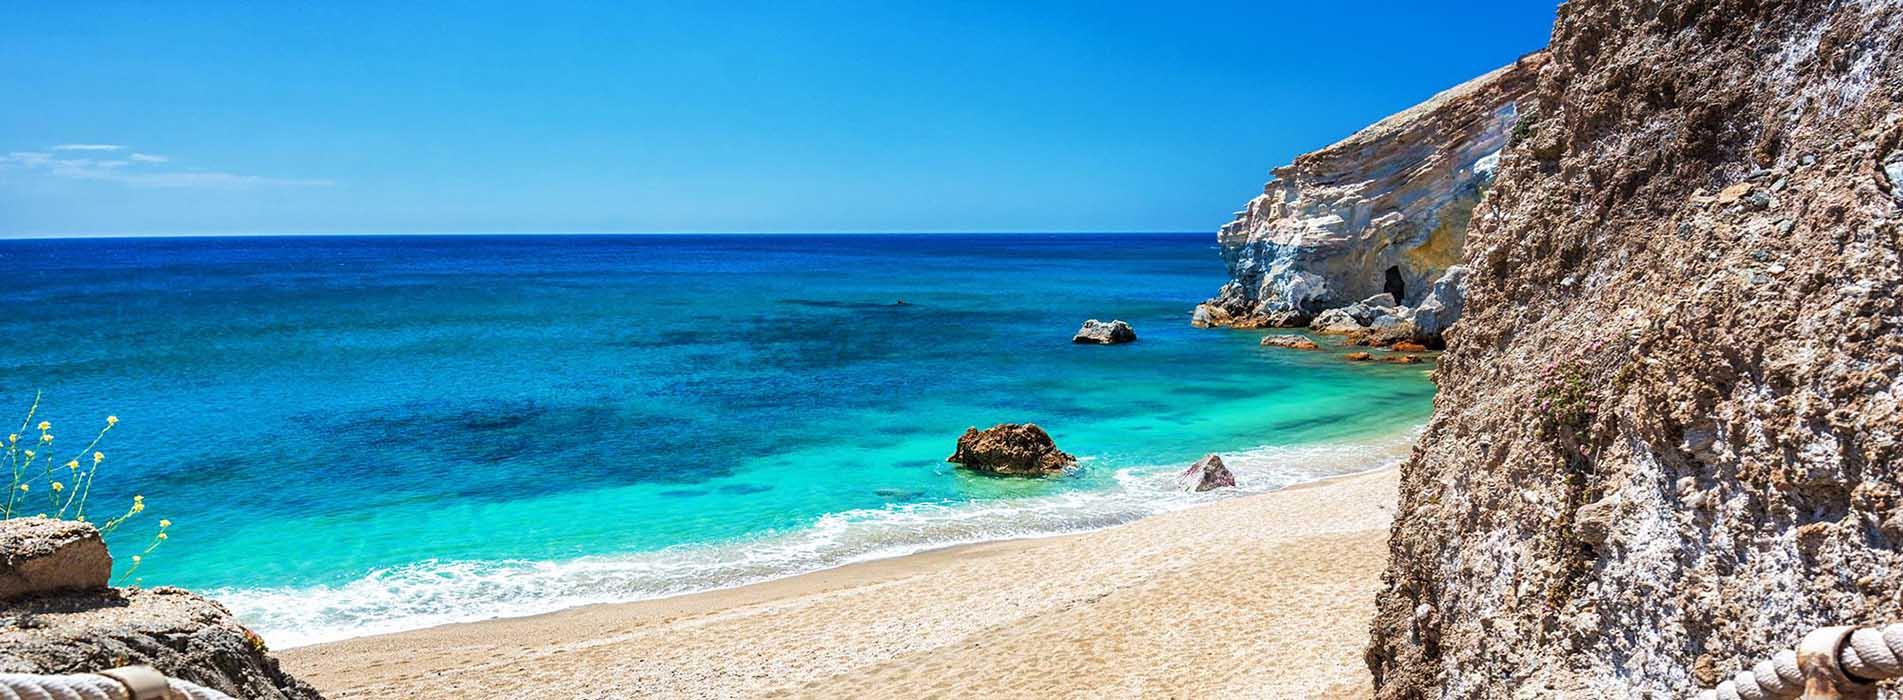 Greece - Milos 14 (main)